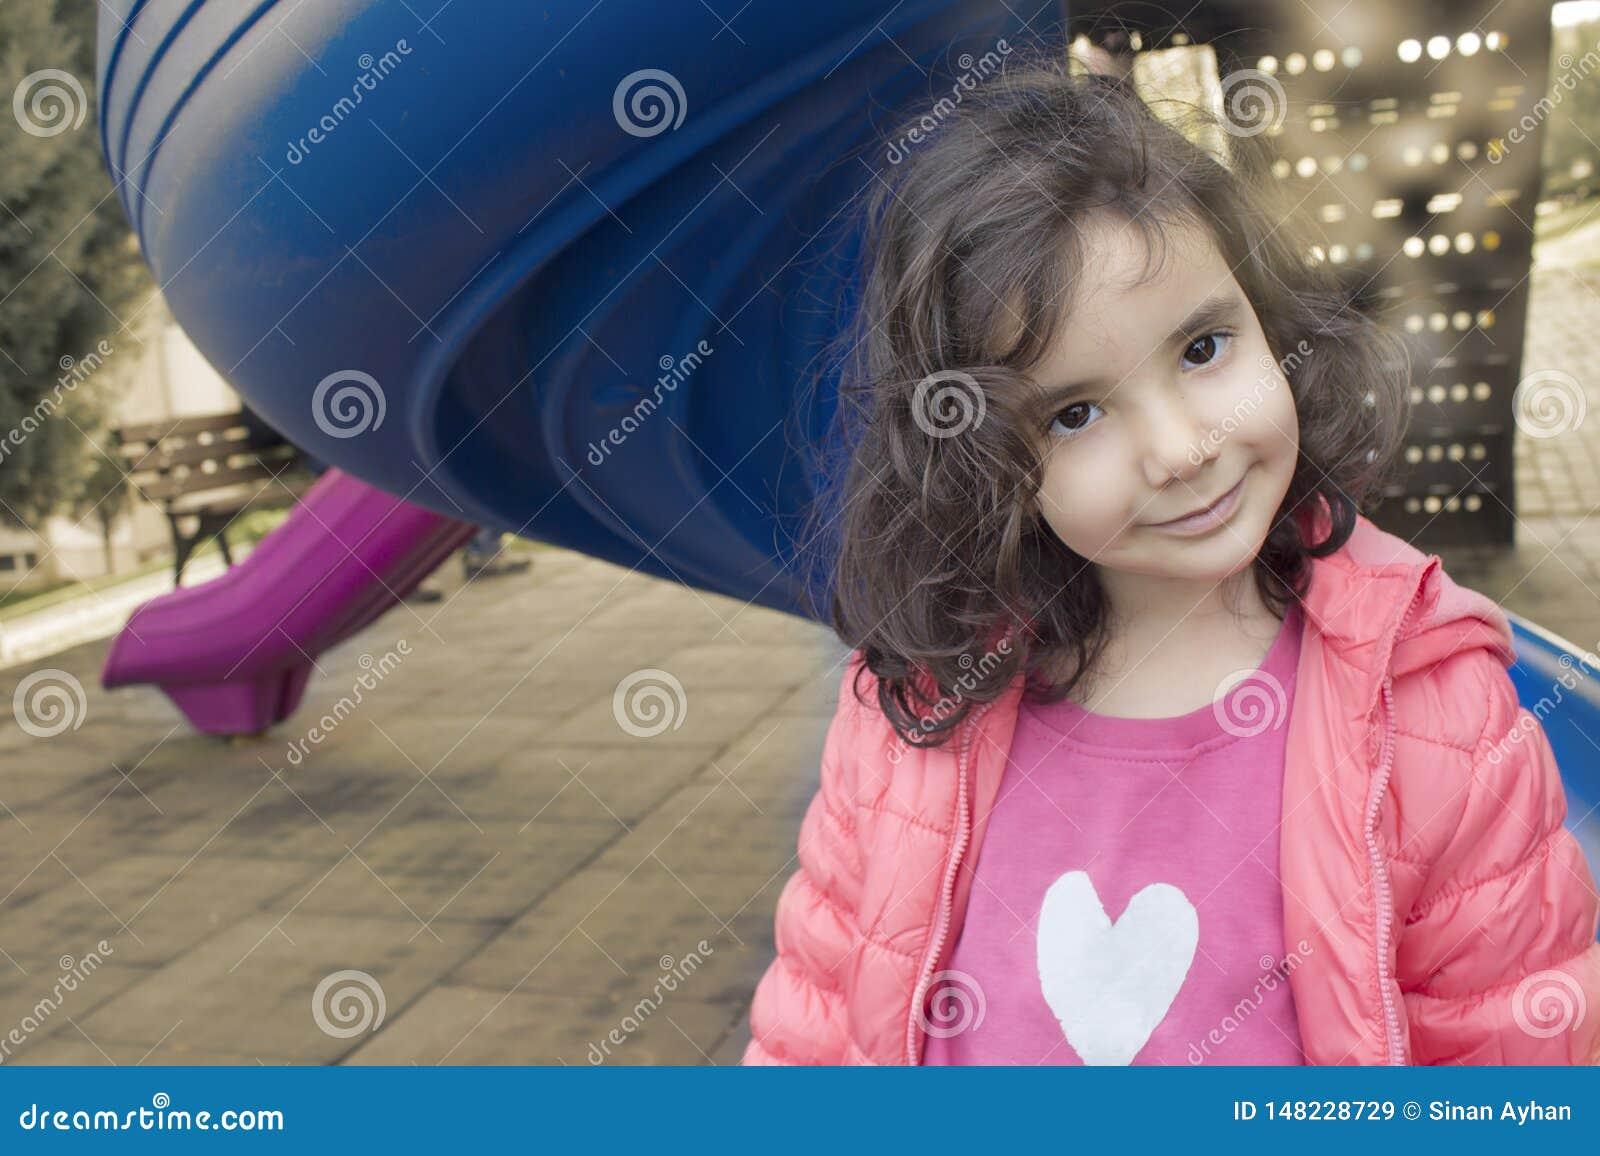 The little girl handing yellow flower